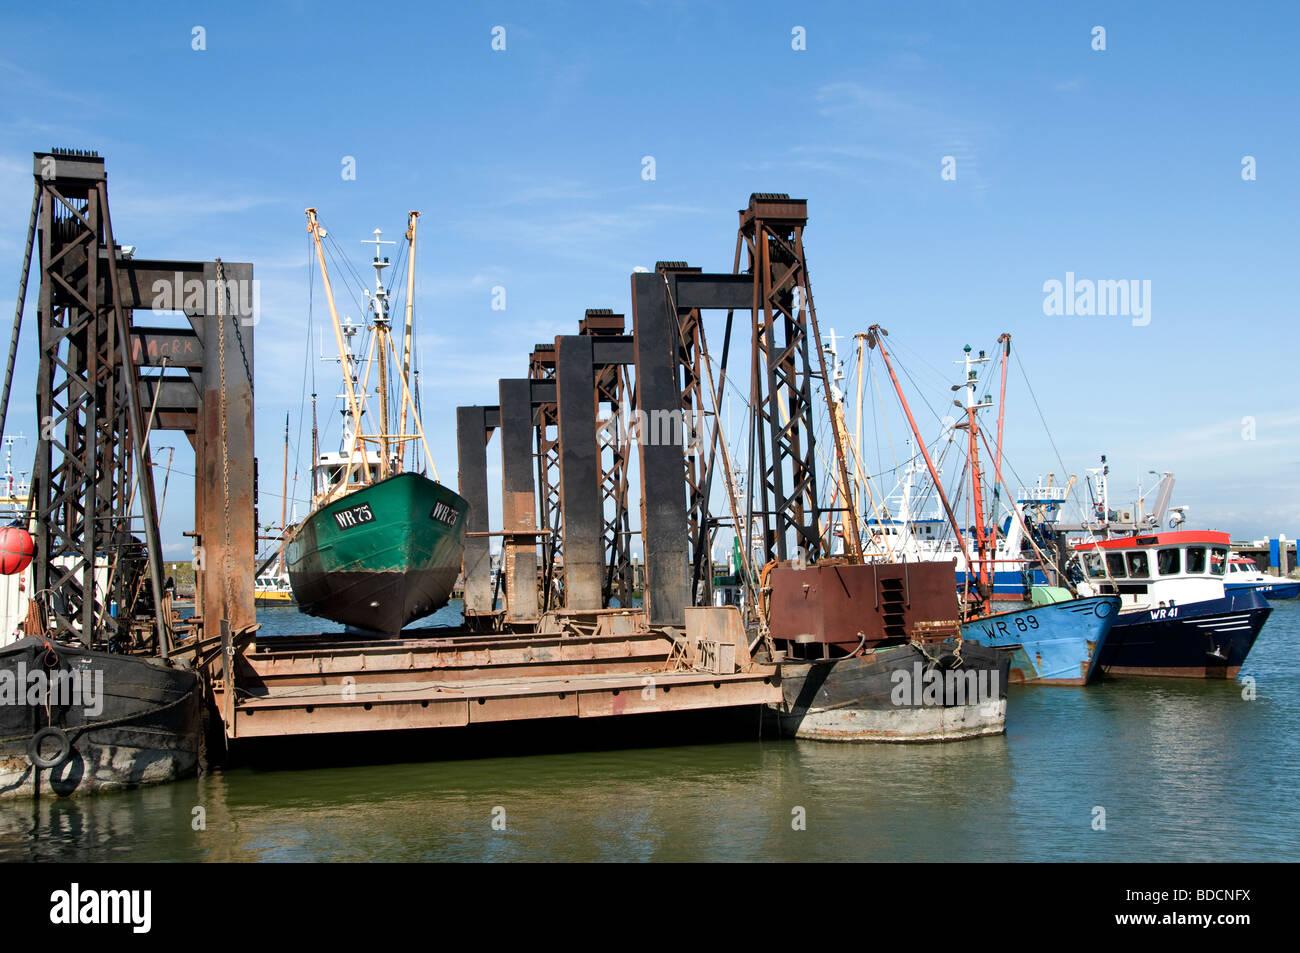 Den Oever Holanda pesca de arrastre dry dock flotante astillero de Puerto de Mar de Wadden Waddenzee wad Foto de stock